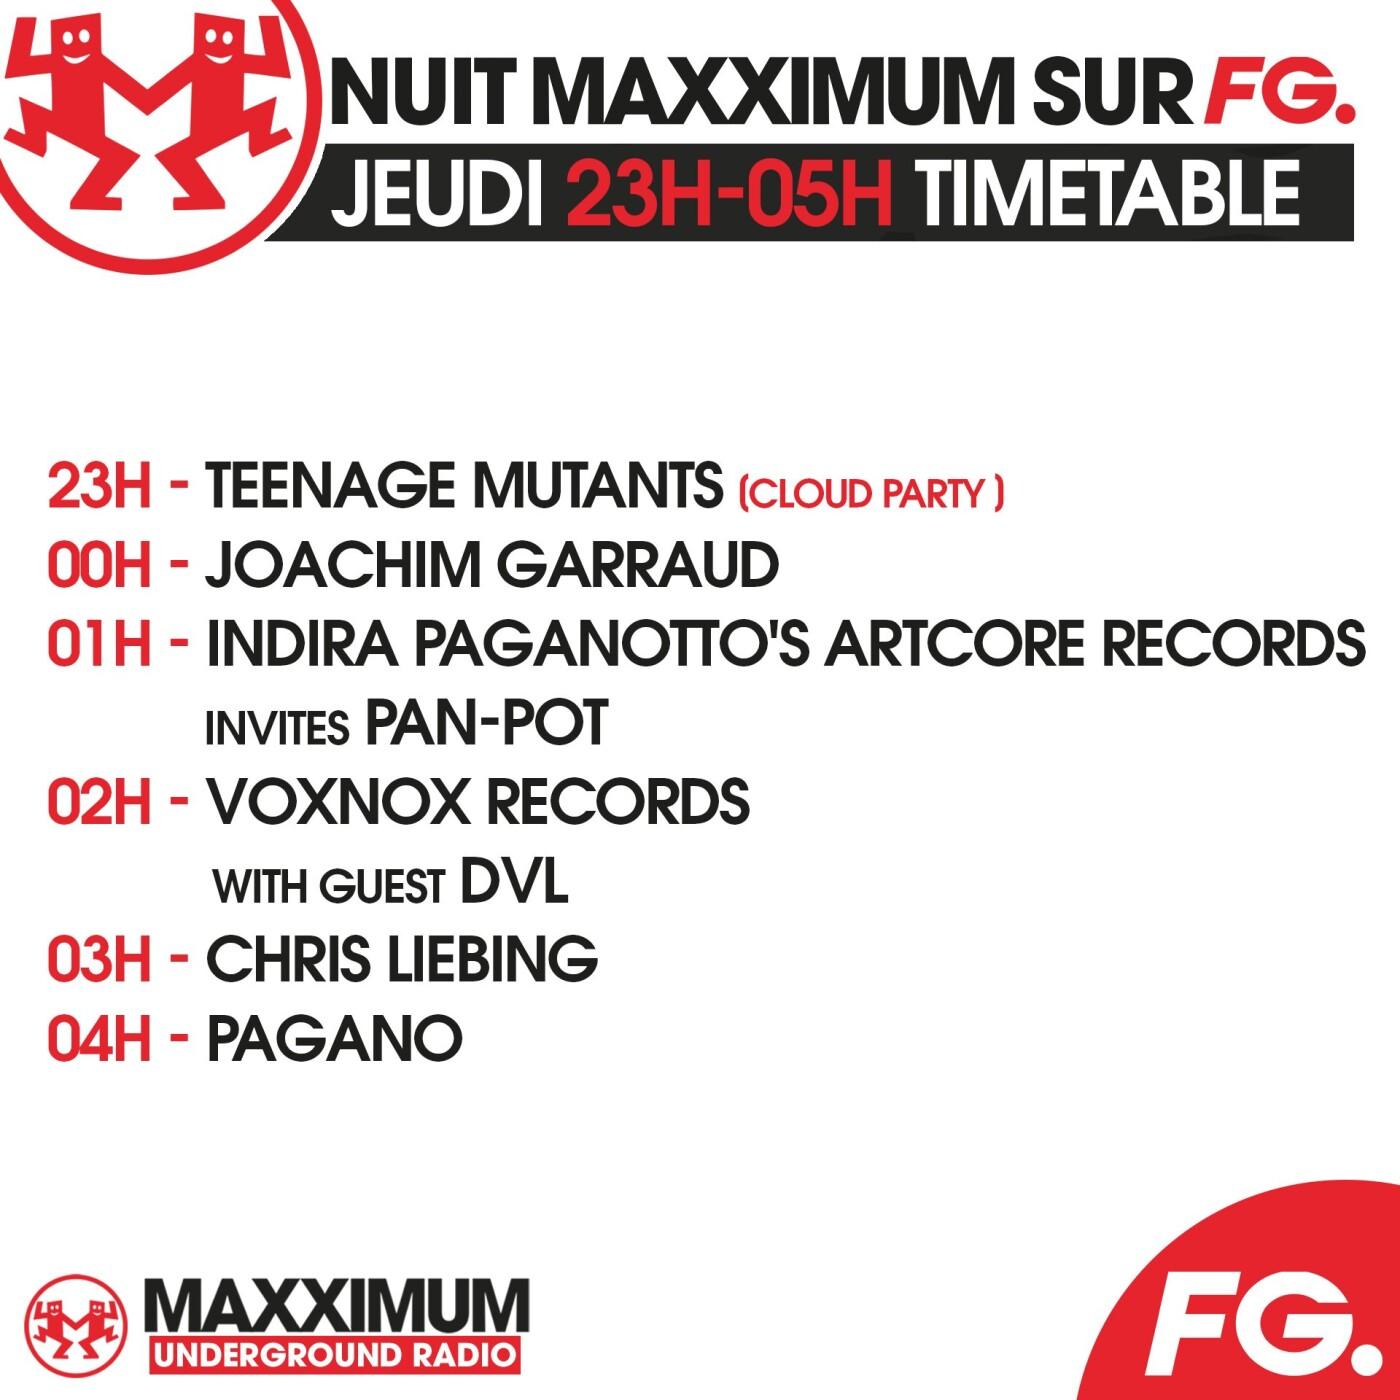 LA NUIT MAXXIMUM SUR FG : TEENAGE MUTANTS